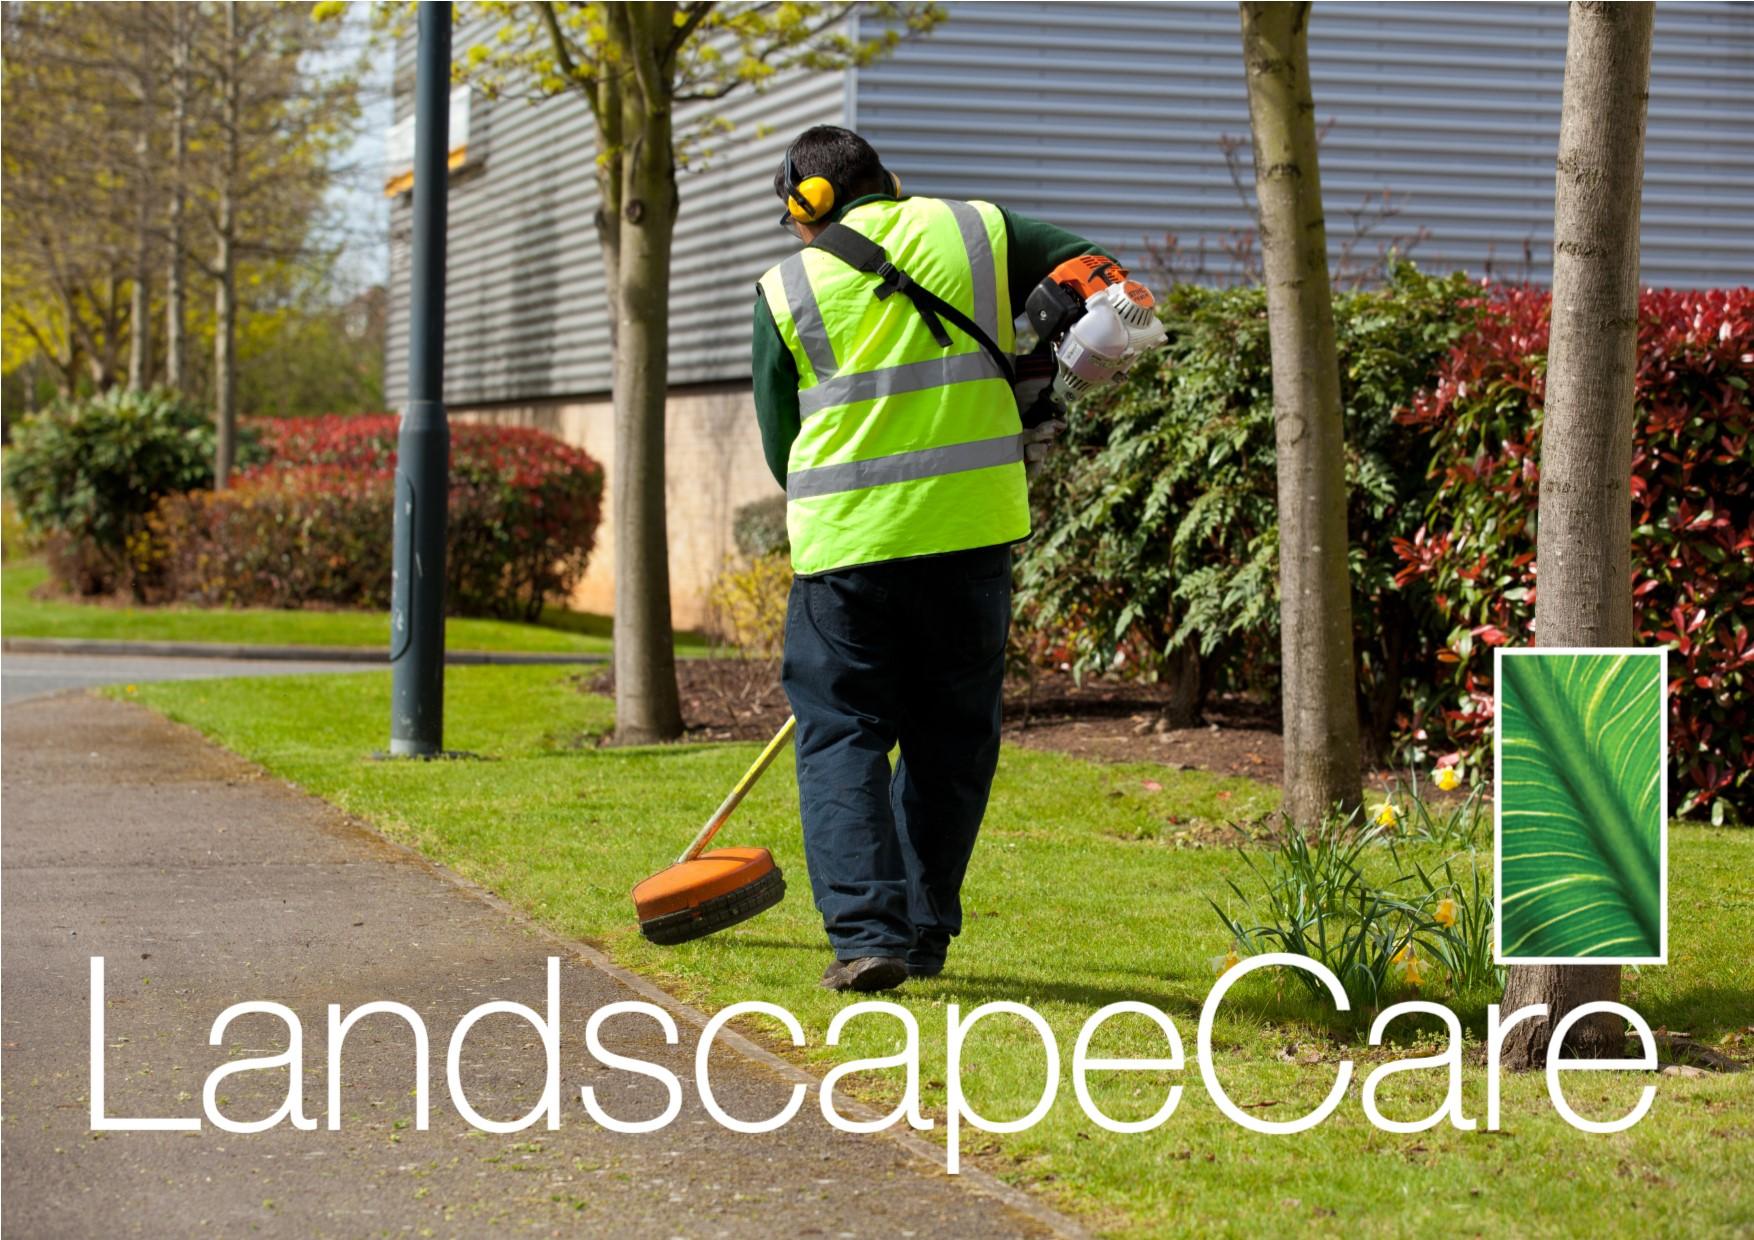 LandscapeCare-grounds-maintenance.jpg